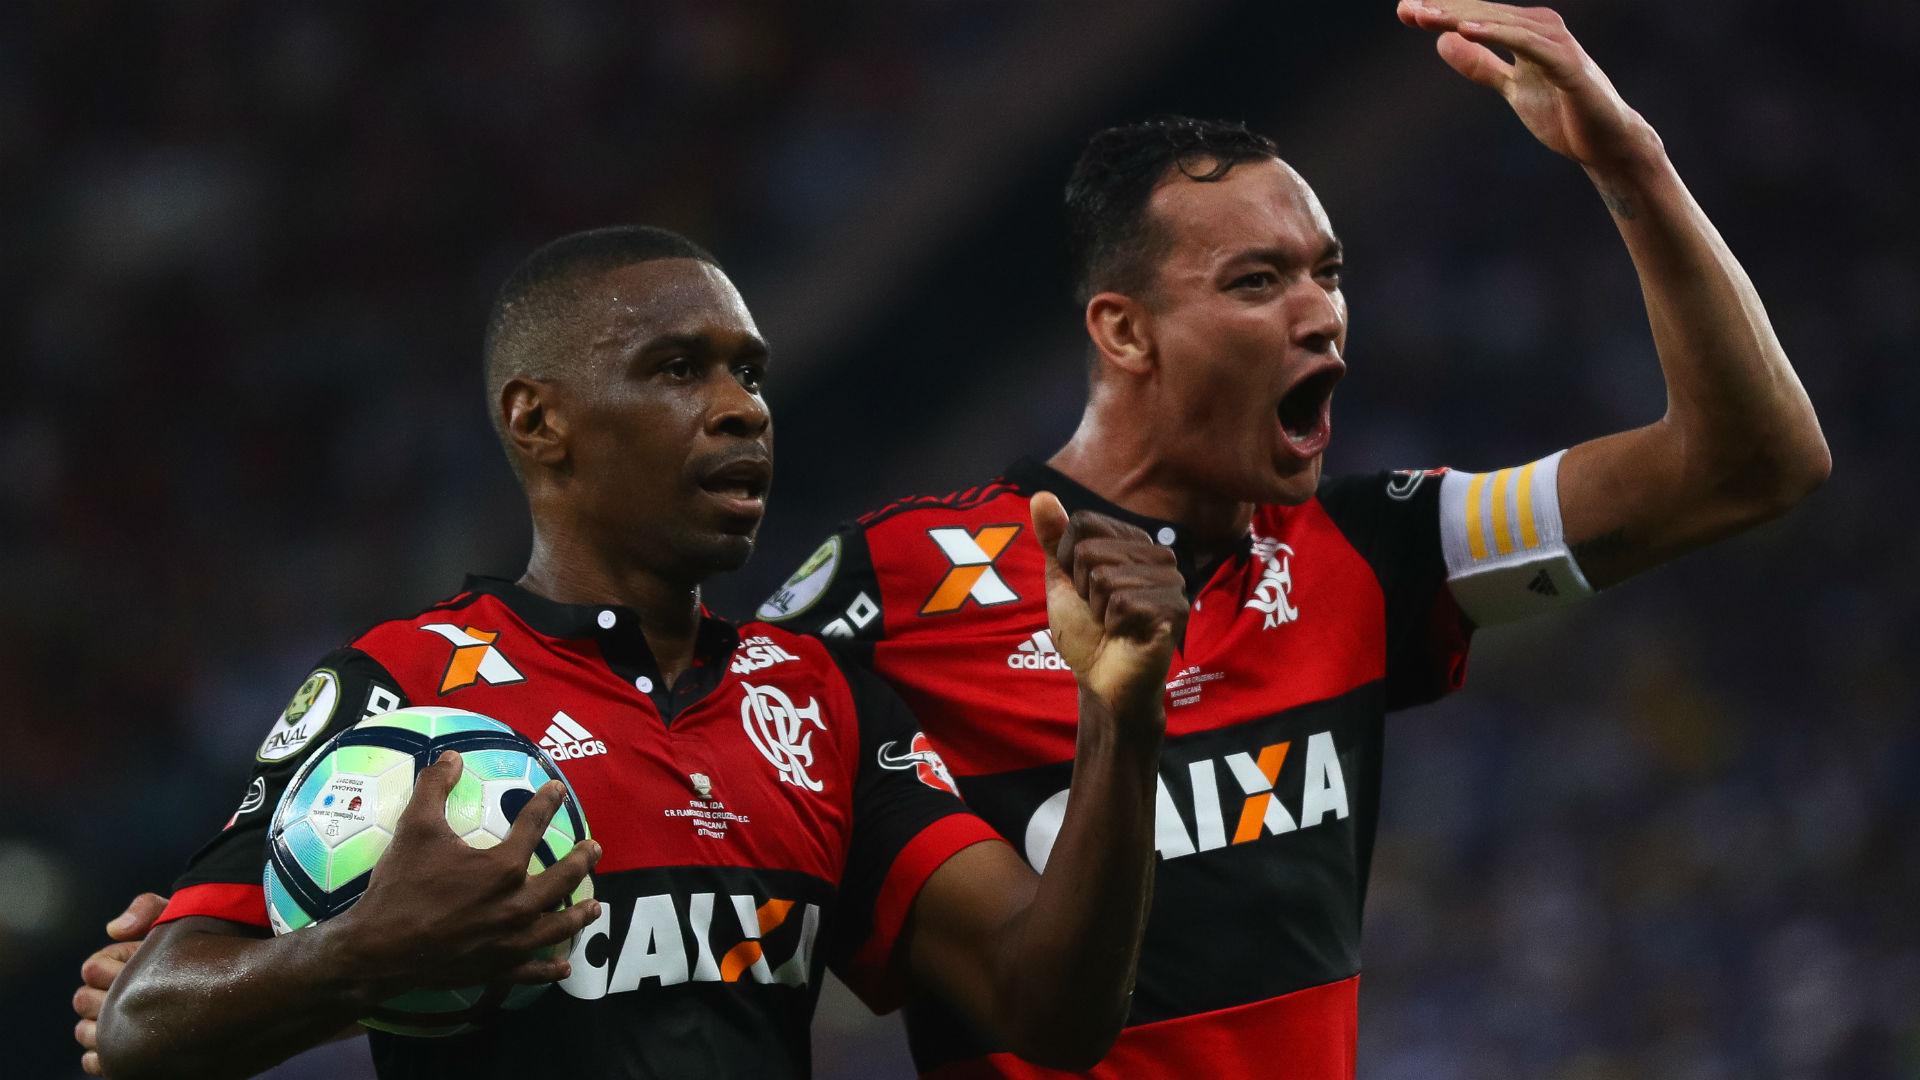 Juan Rever Flamengo Cruzeiro Copa do Brasil 08 09 2017